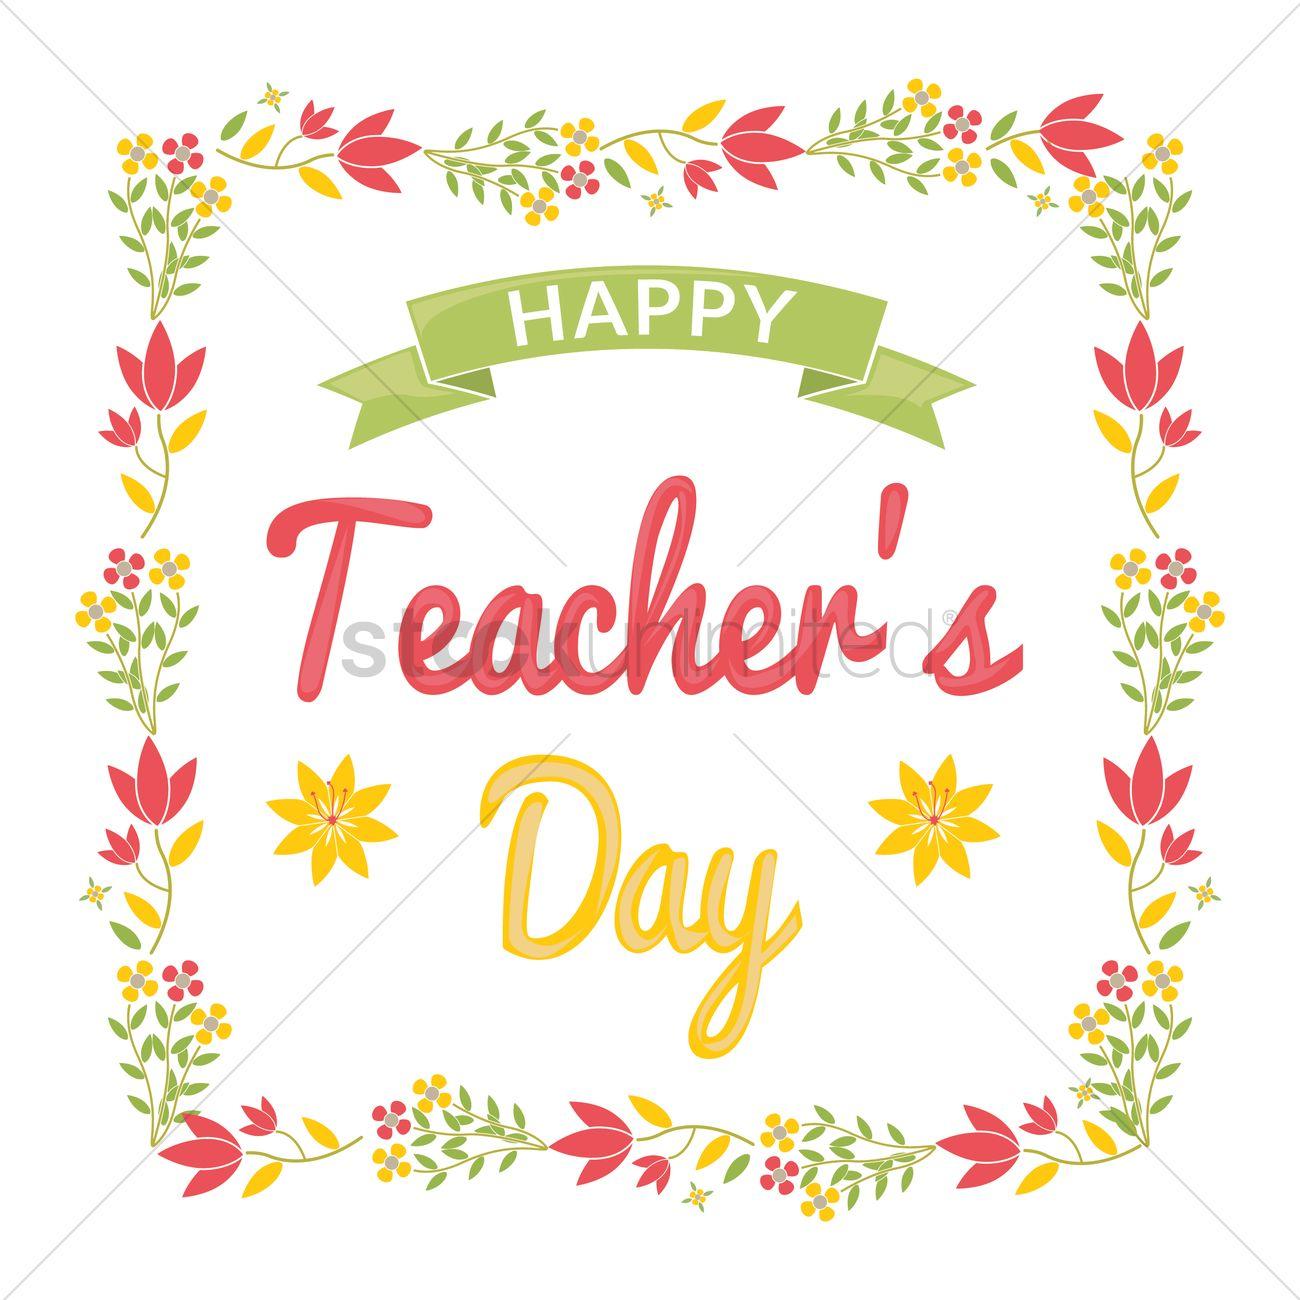 happy teacher's day design vector image  1968688